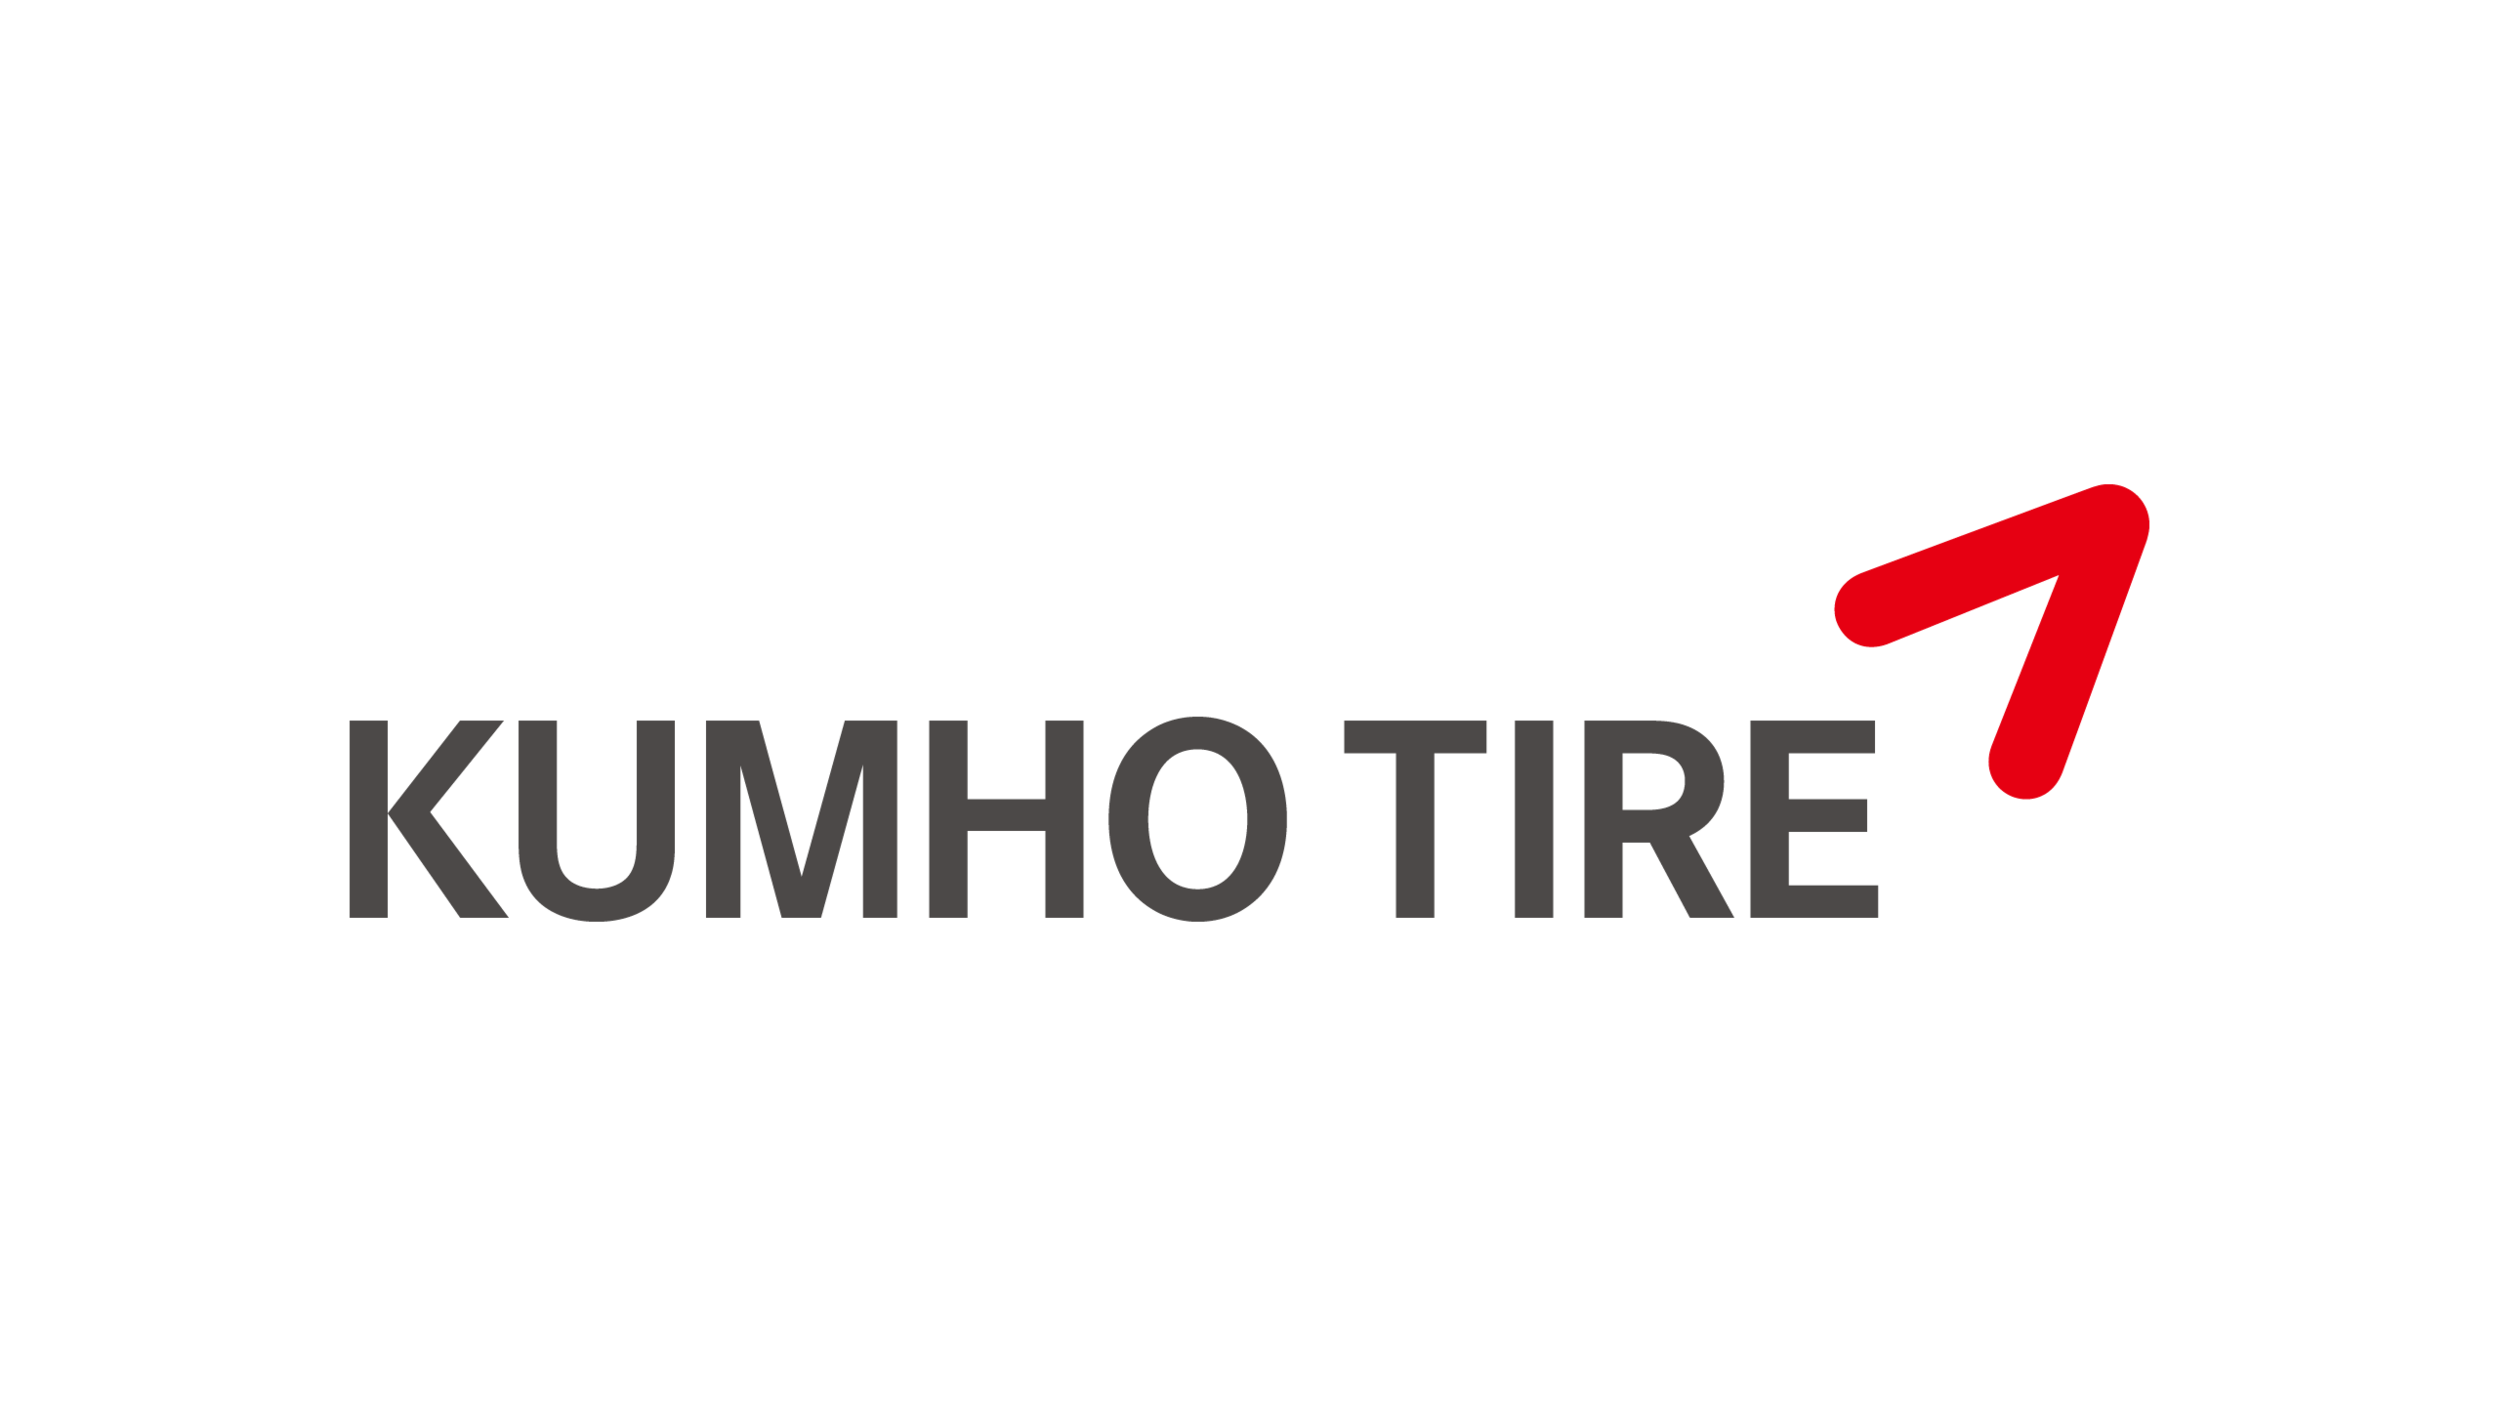 Kumho-Tire-logo-2560x1440.png